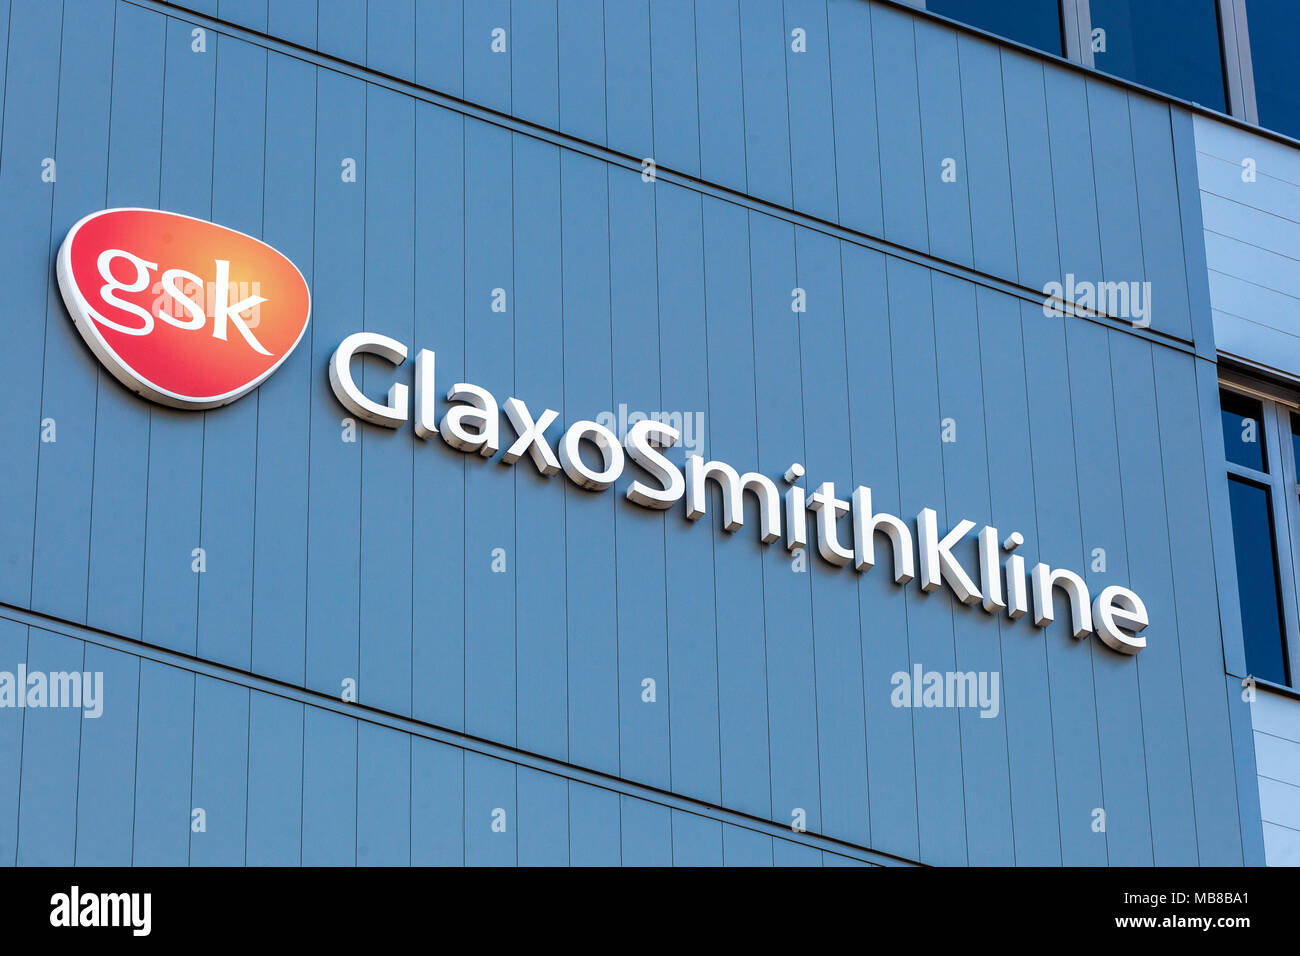 Gsk stock photos gsk stock images alamy gsk glaxosmithkline logo dresden germany stock image biocorpaavc Gallery